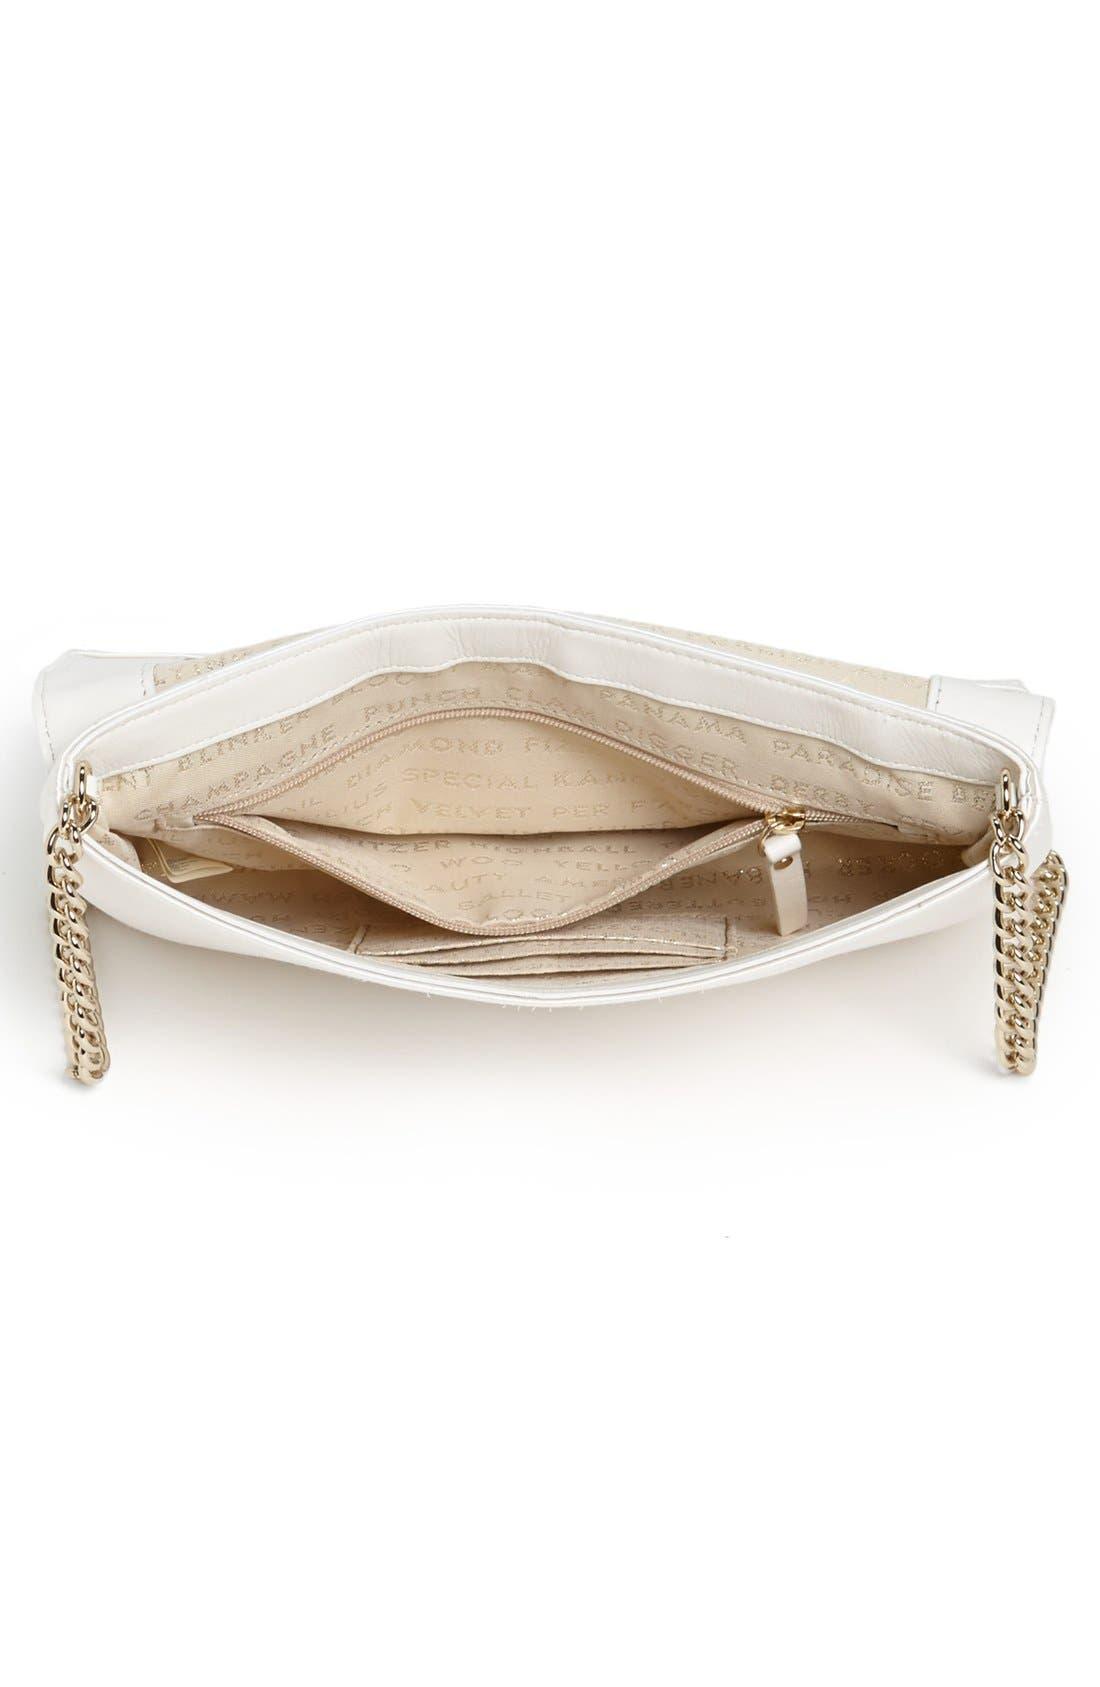 Alternate Image 3  - kate spade new york 'alouette - wedding belles' handbag